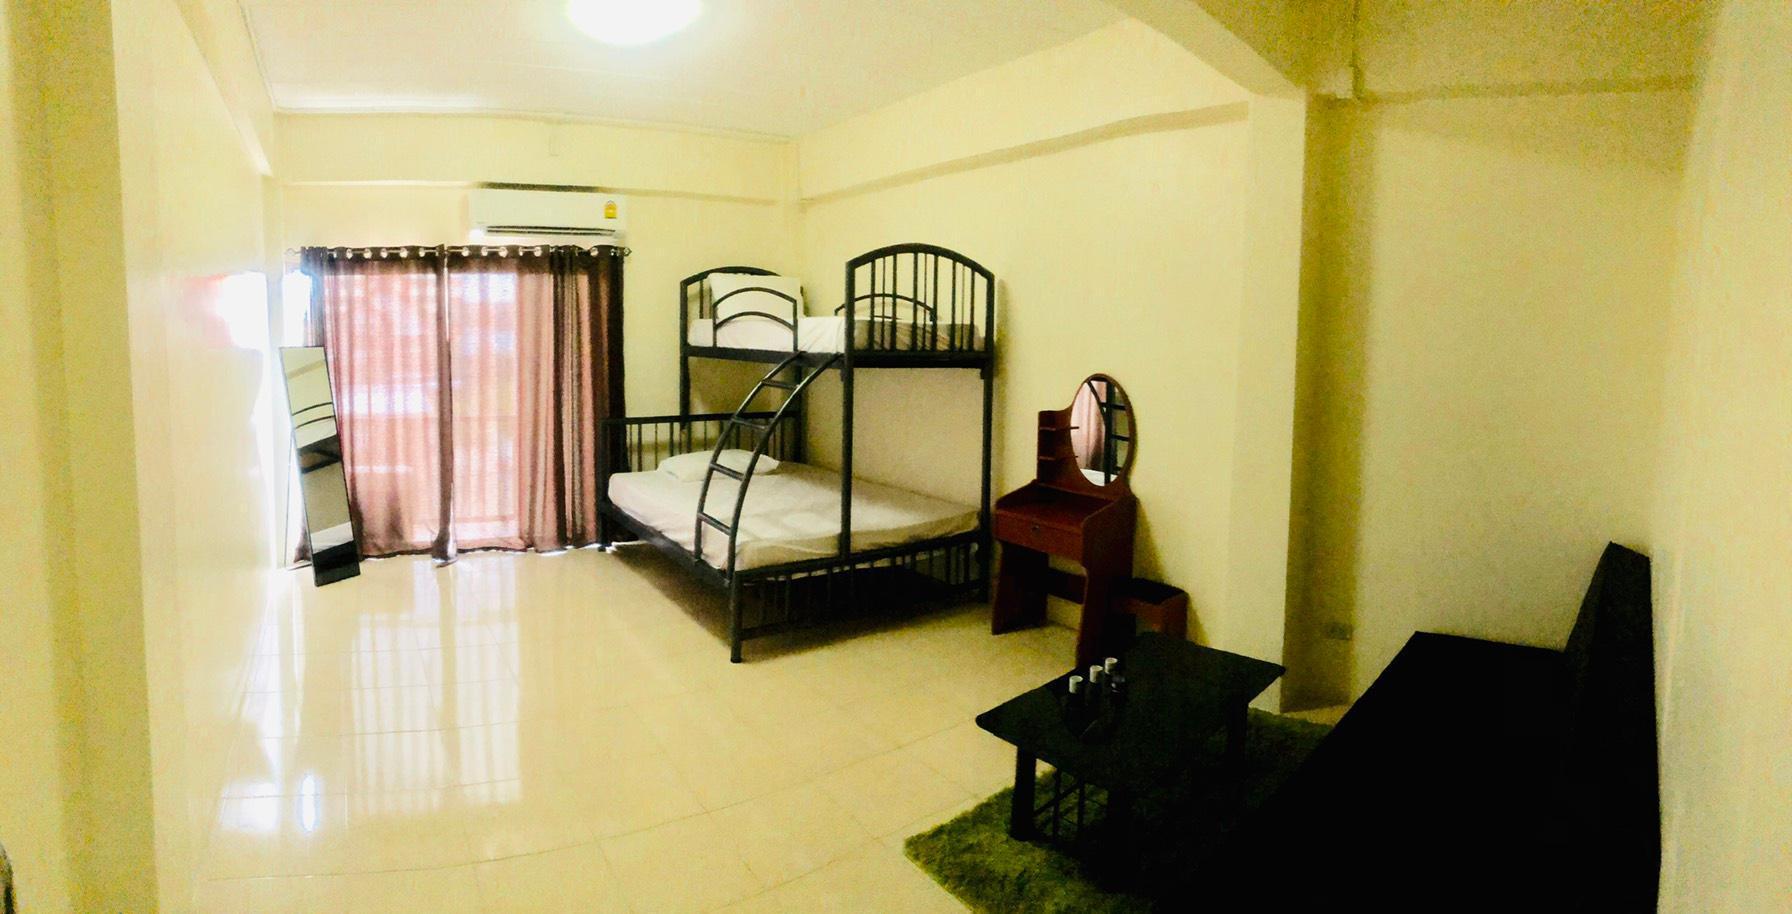 Easy Sleep House, Don Muang